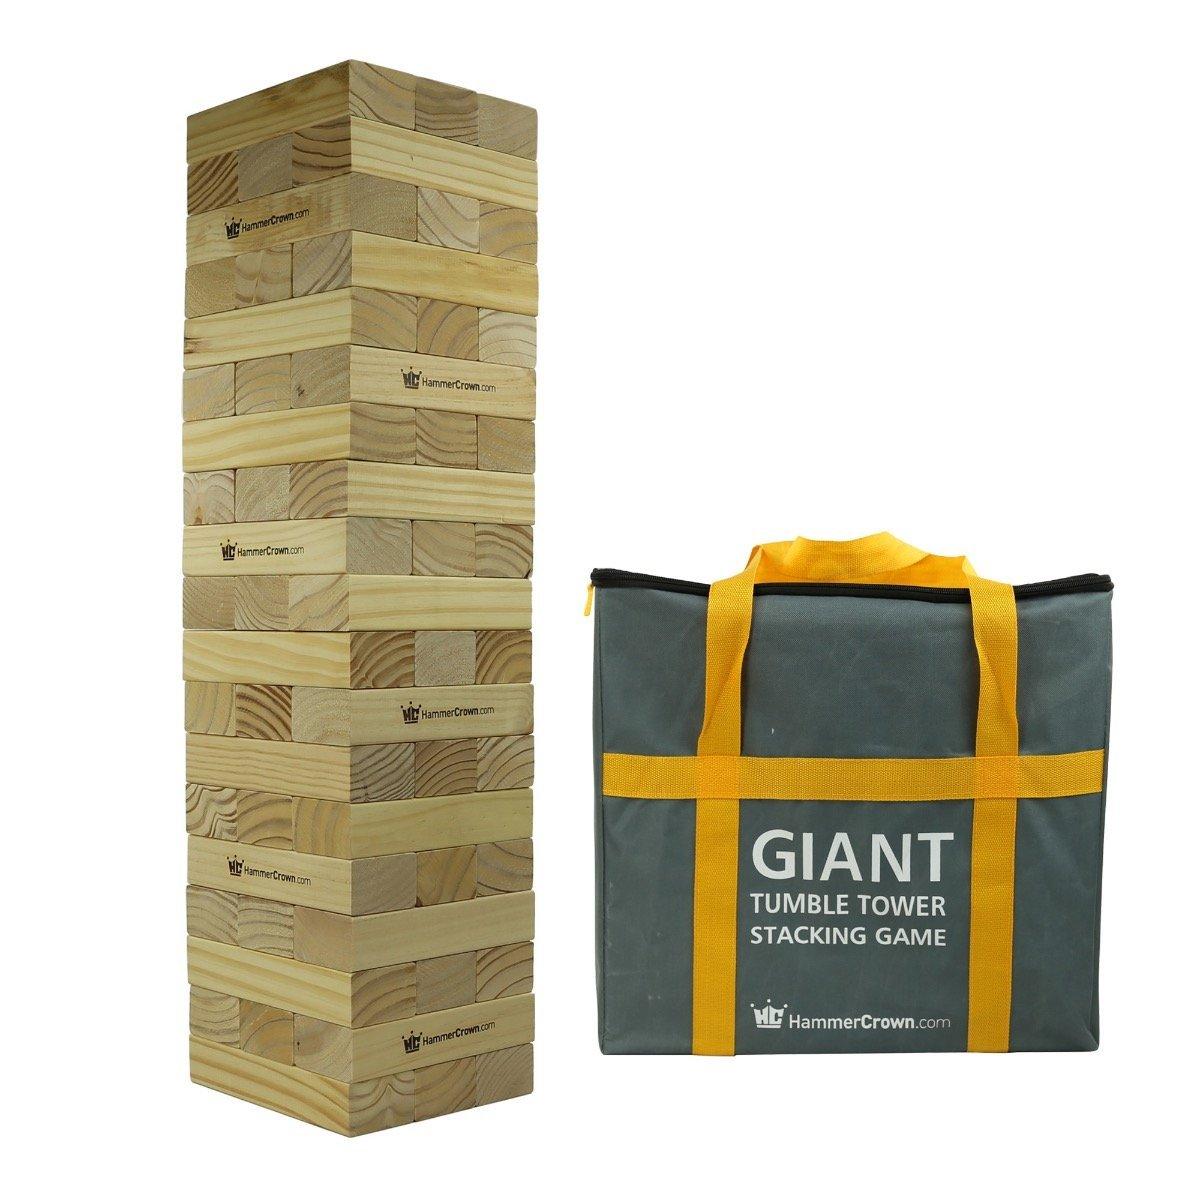 Christmas Gift Ideas For Outdoorsmen Part - 27: Giant Tumble Tower